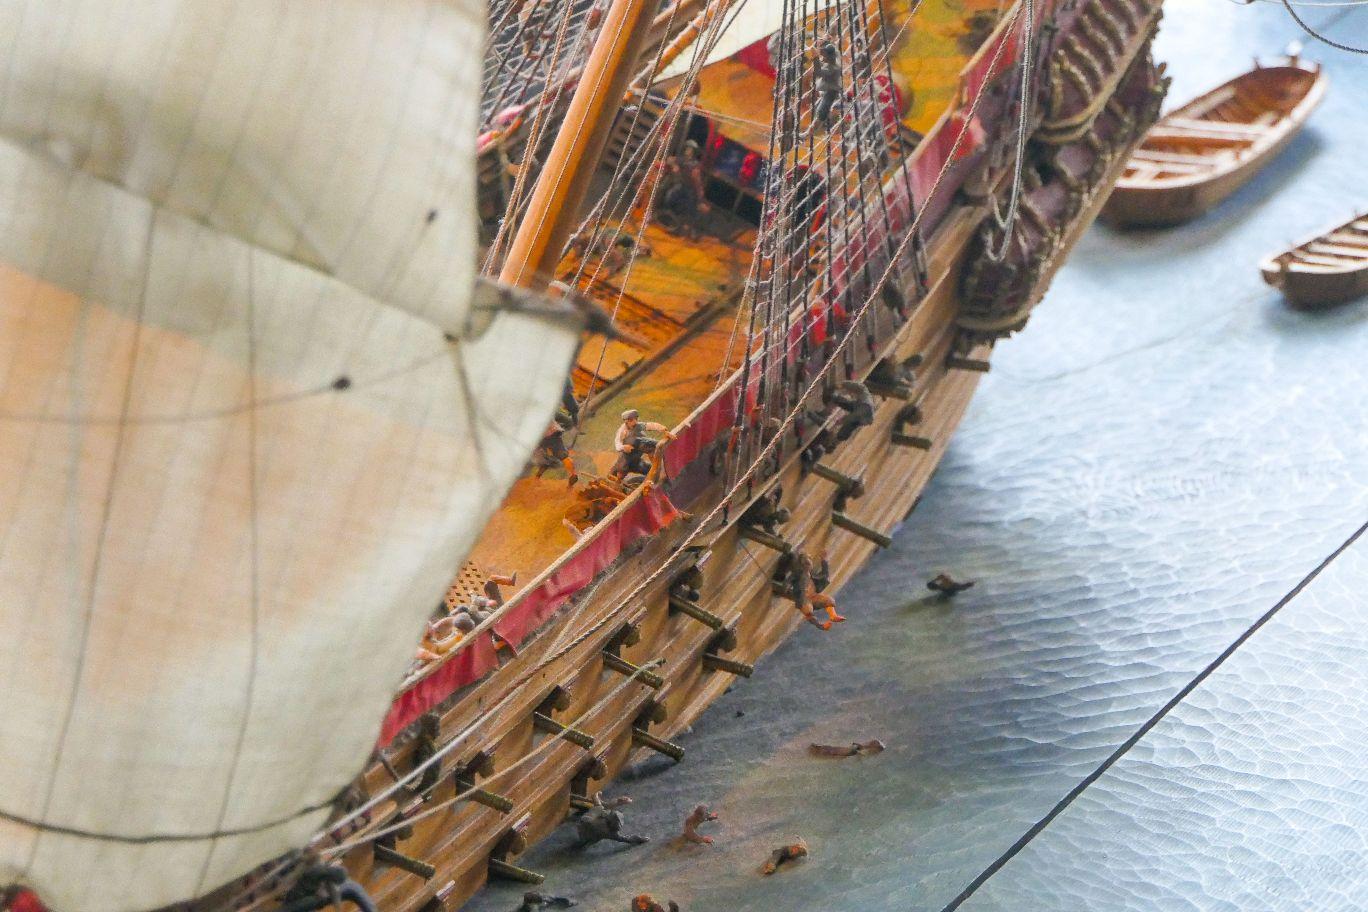 Stockholm Schweden Djurgarden Vasa Museum Schiff Kriegsschiff historisch Untergang